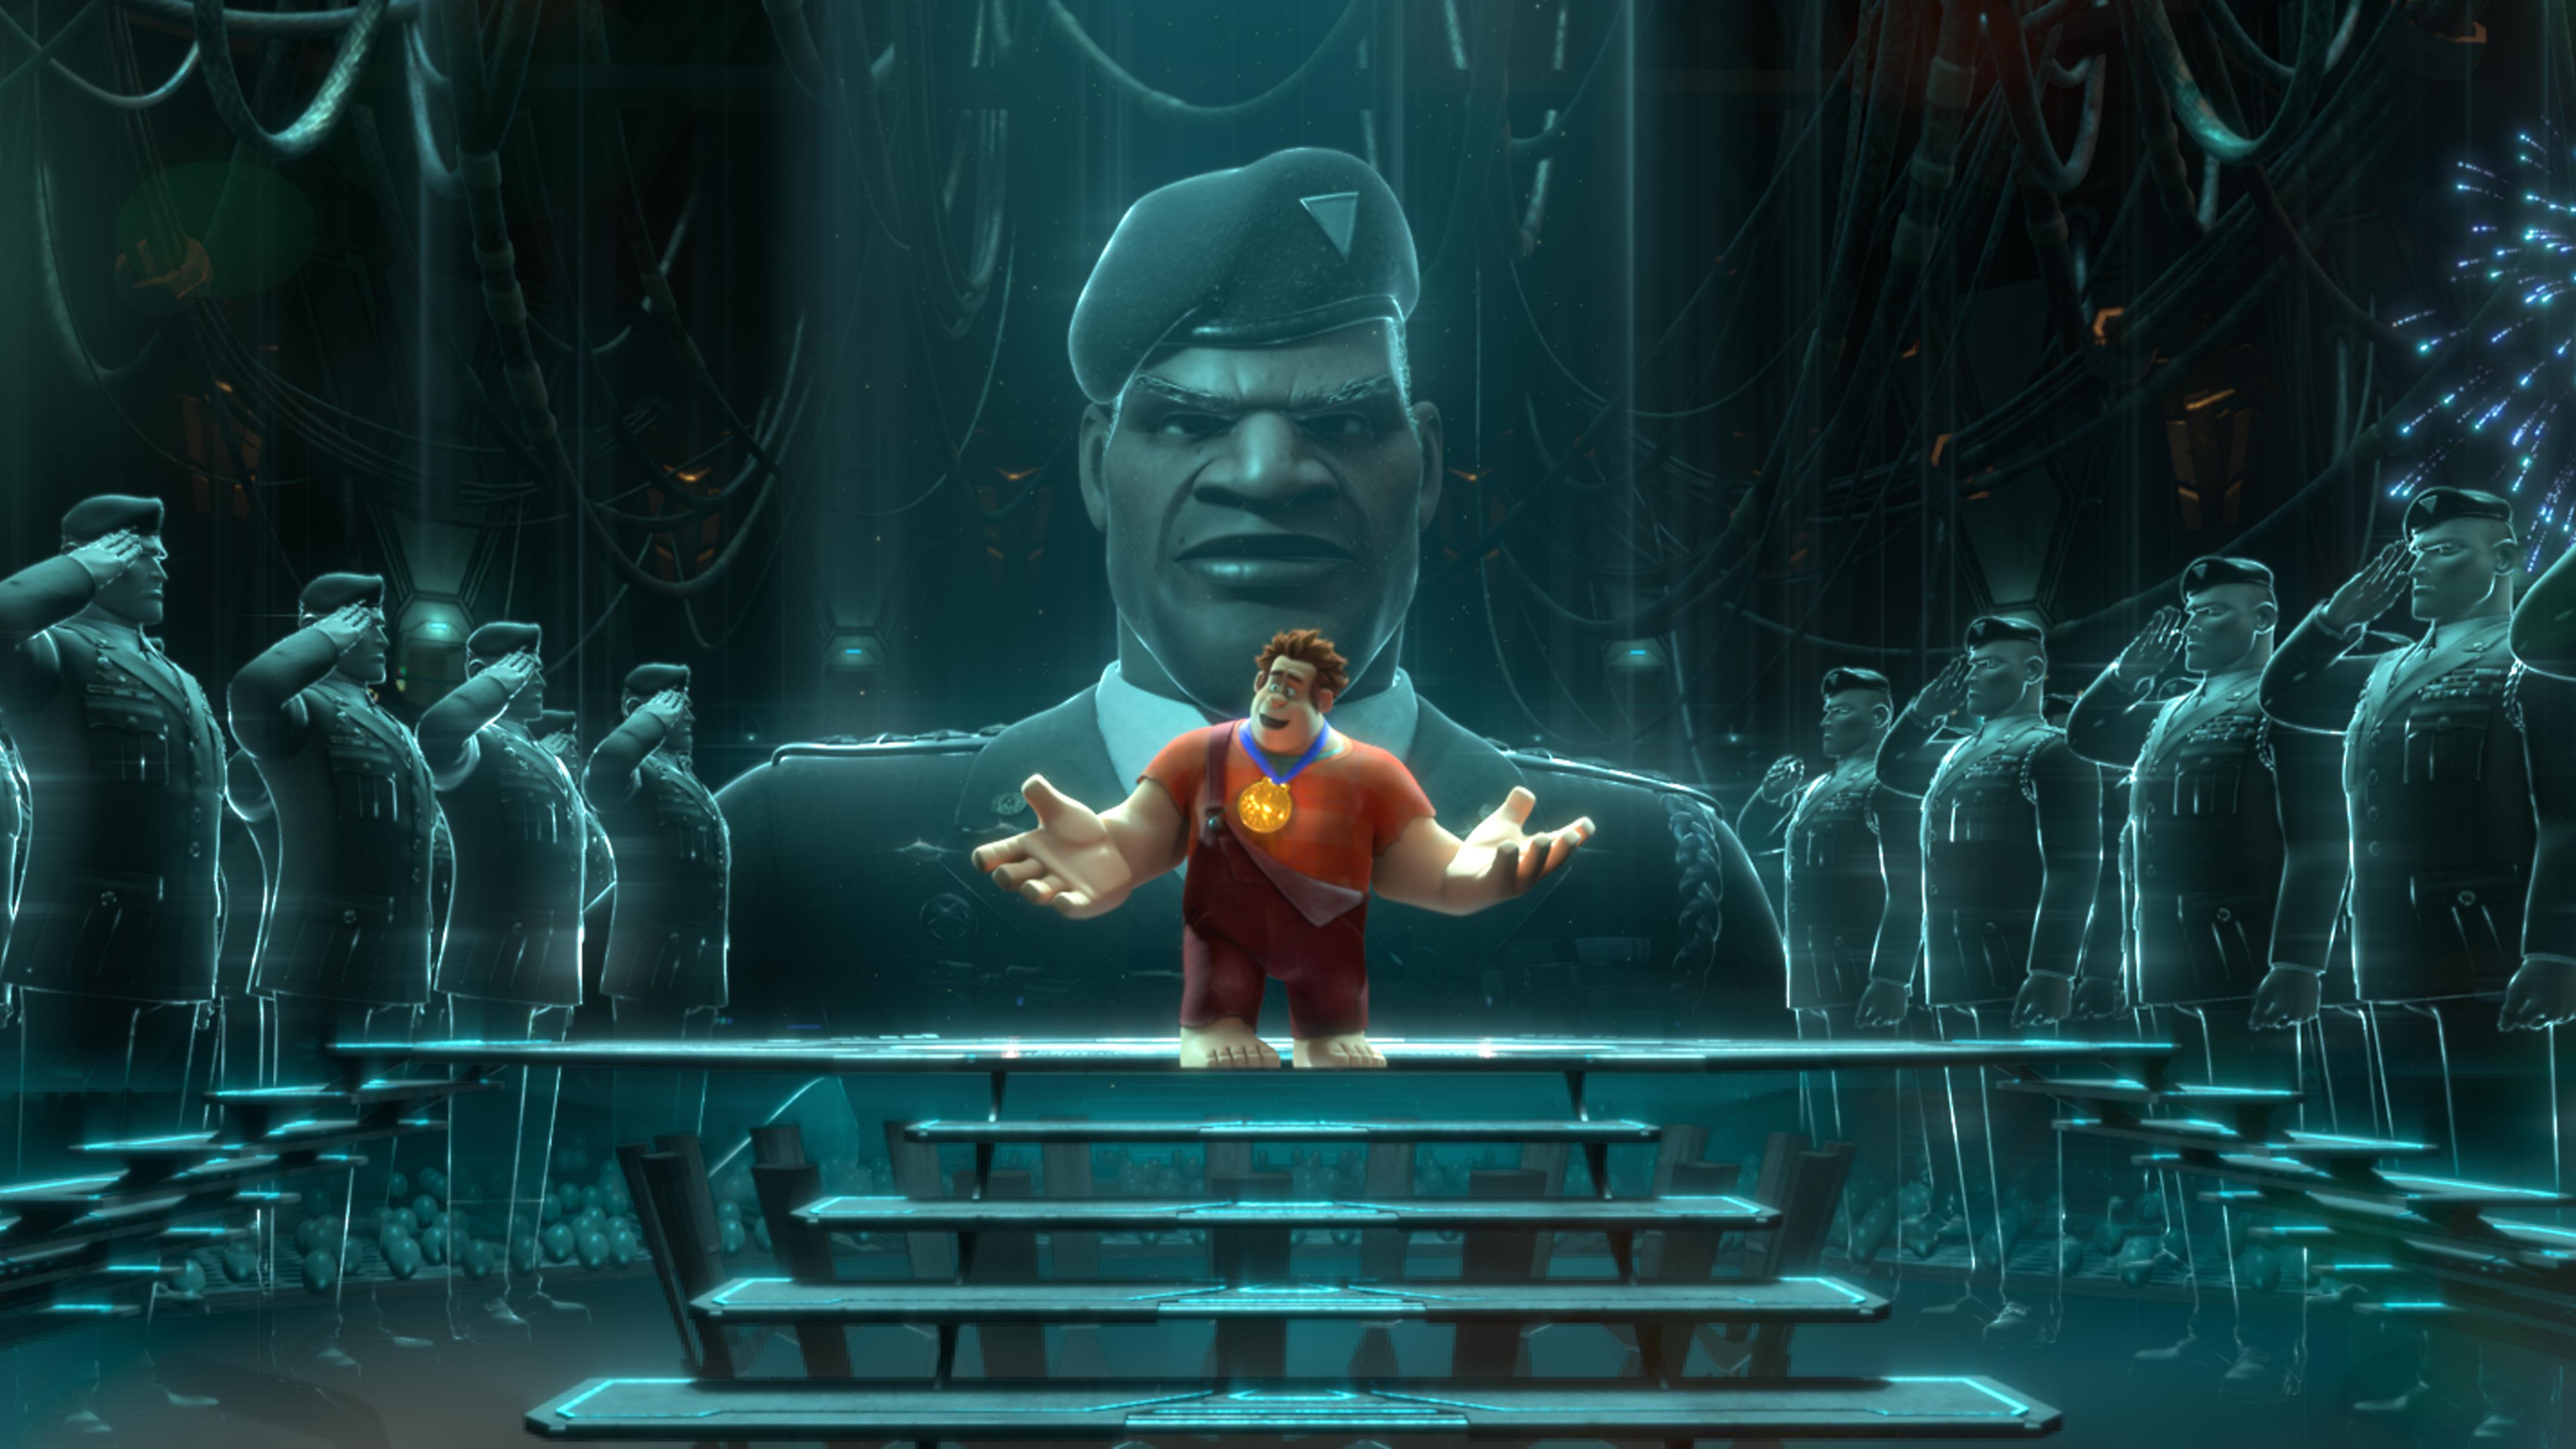 Wreck It Ralph Animation Movie 4k Hd Desktop Wallpaper For: Wreck-It Ralph 4k Ultra HD Wallpaper